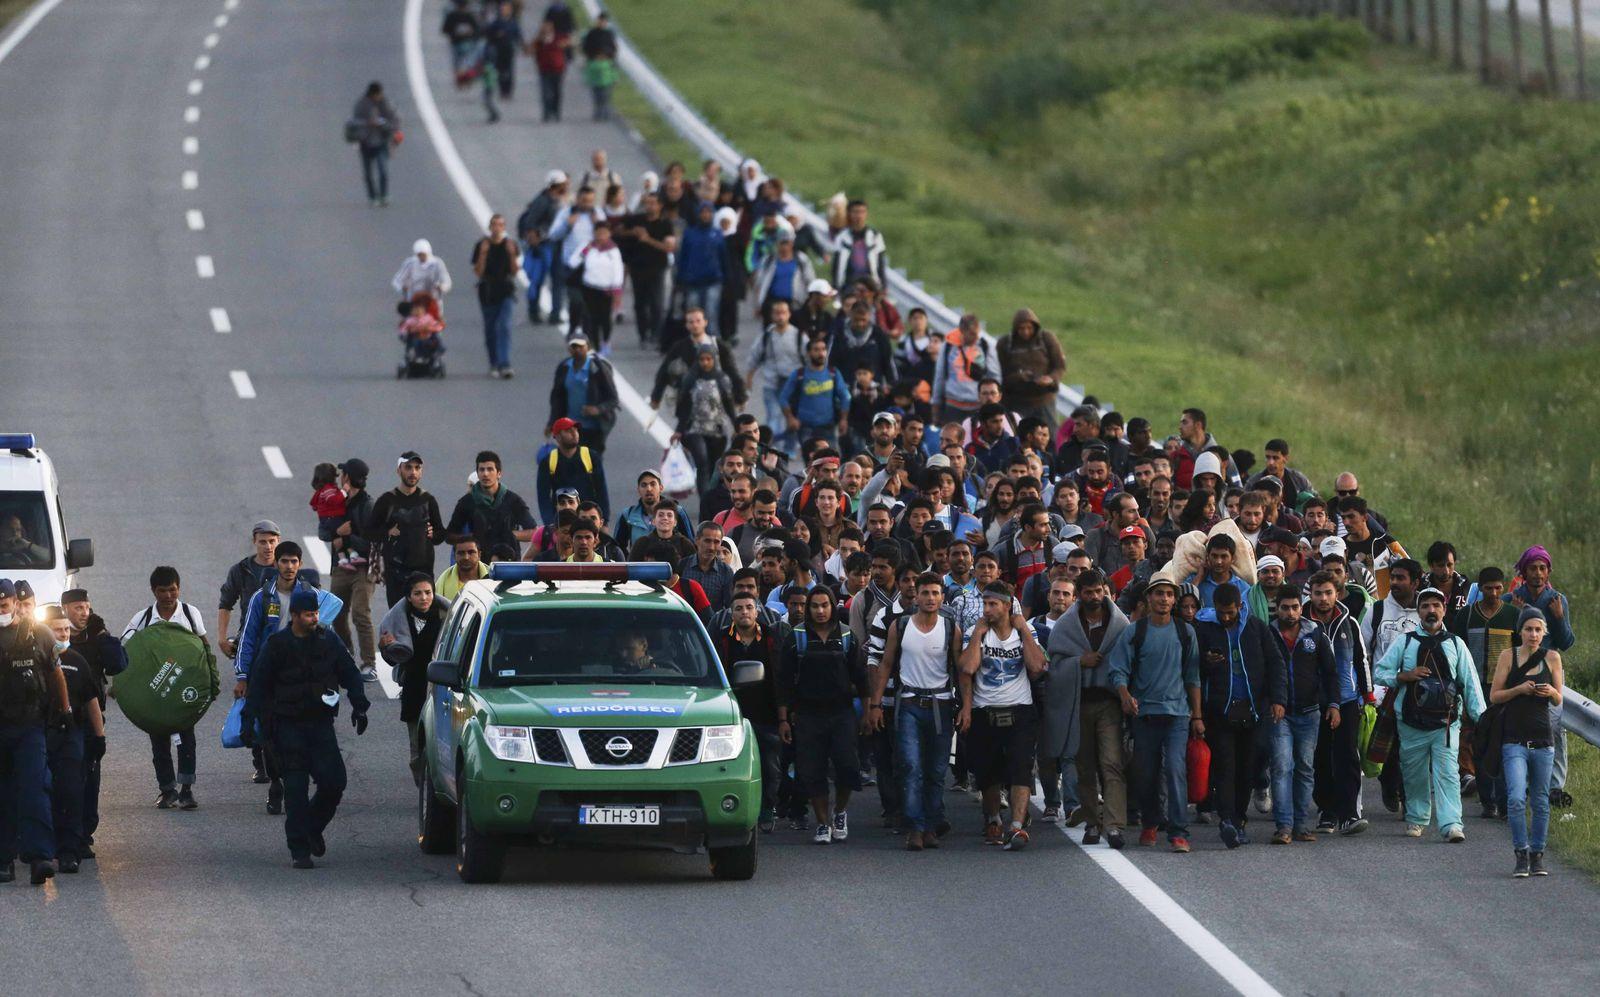 ungarn flüchtlinge autobahn